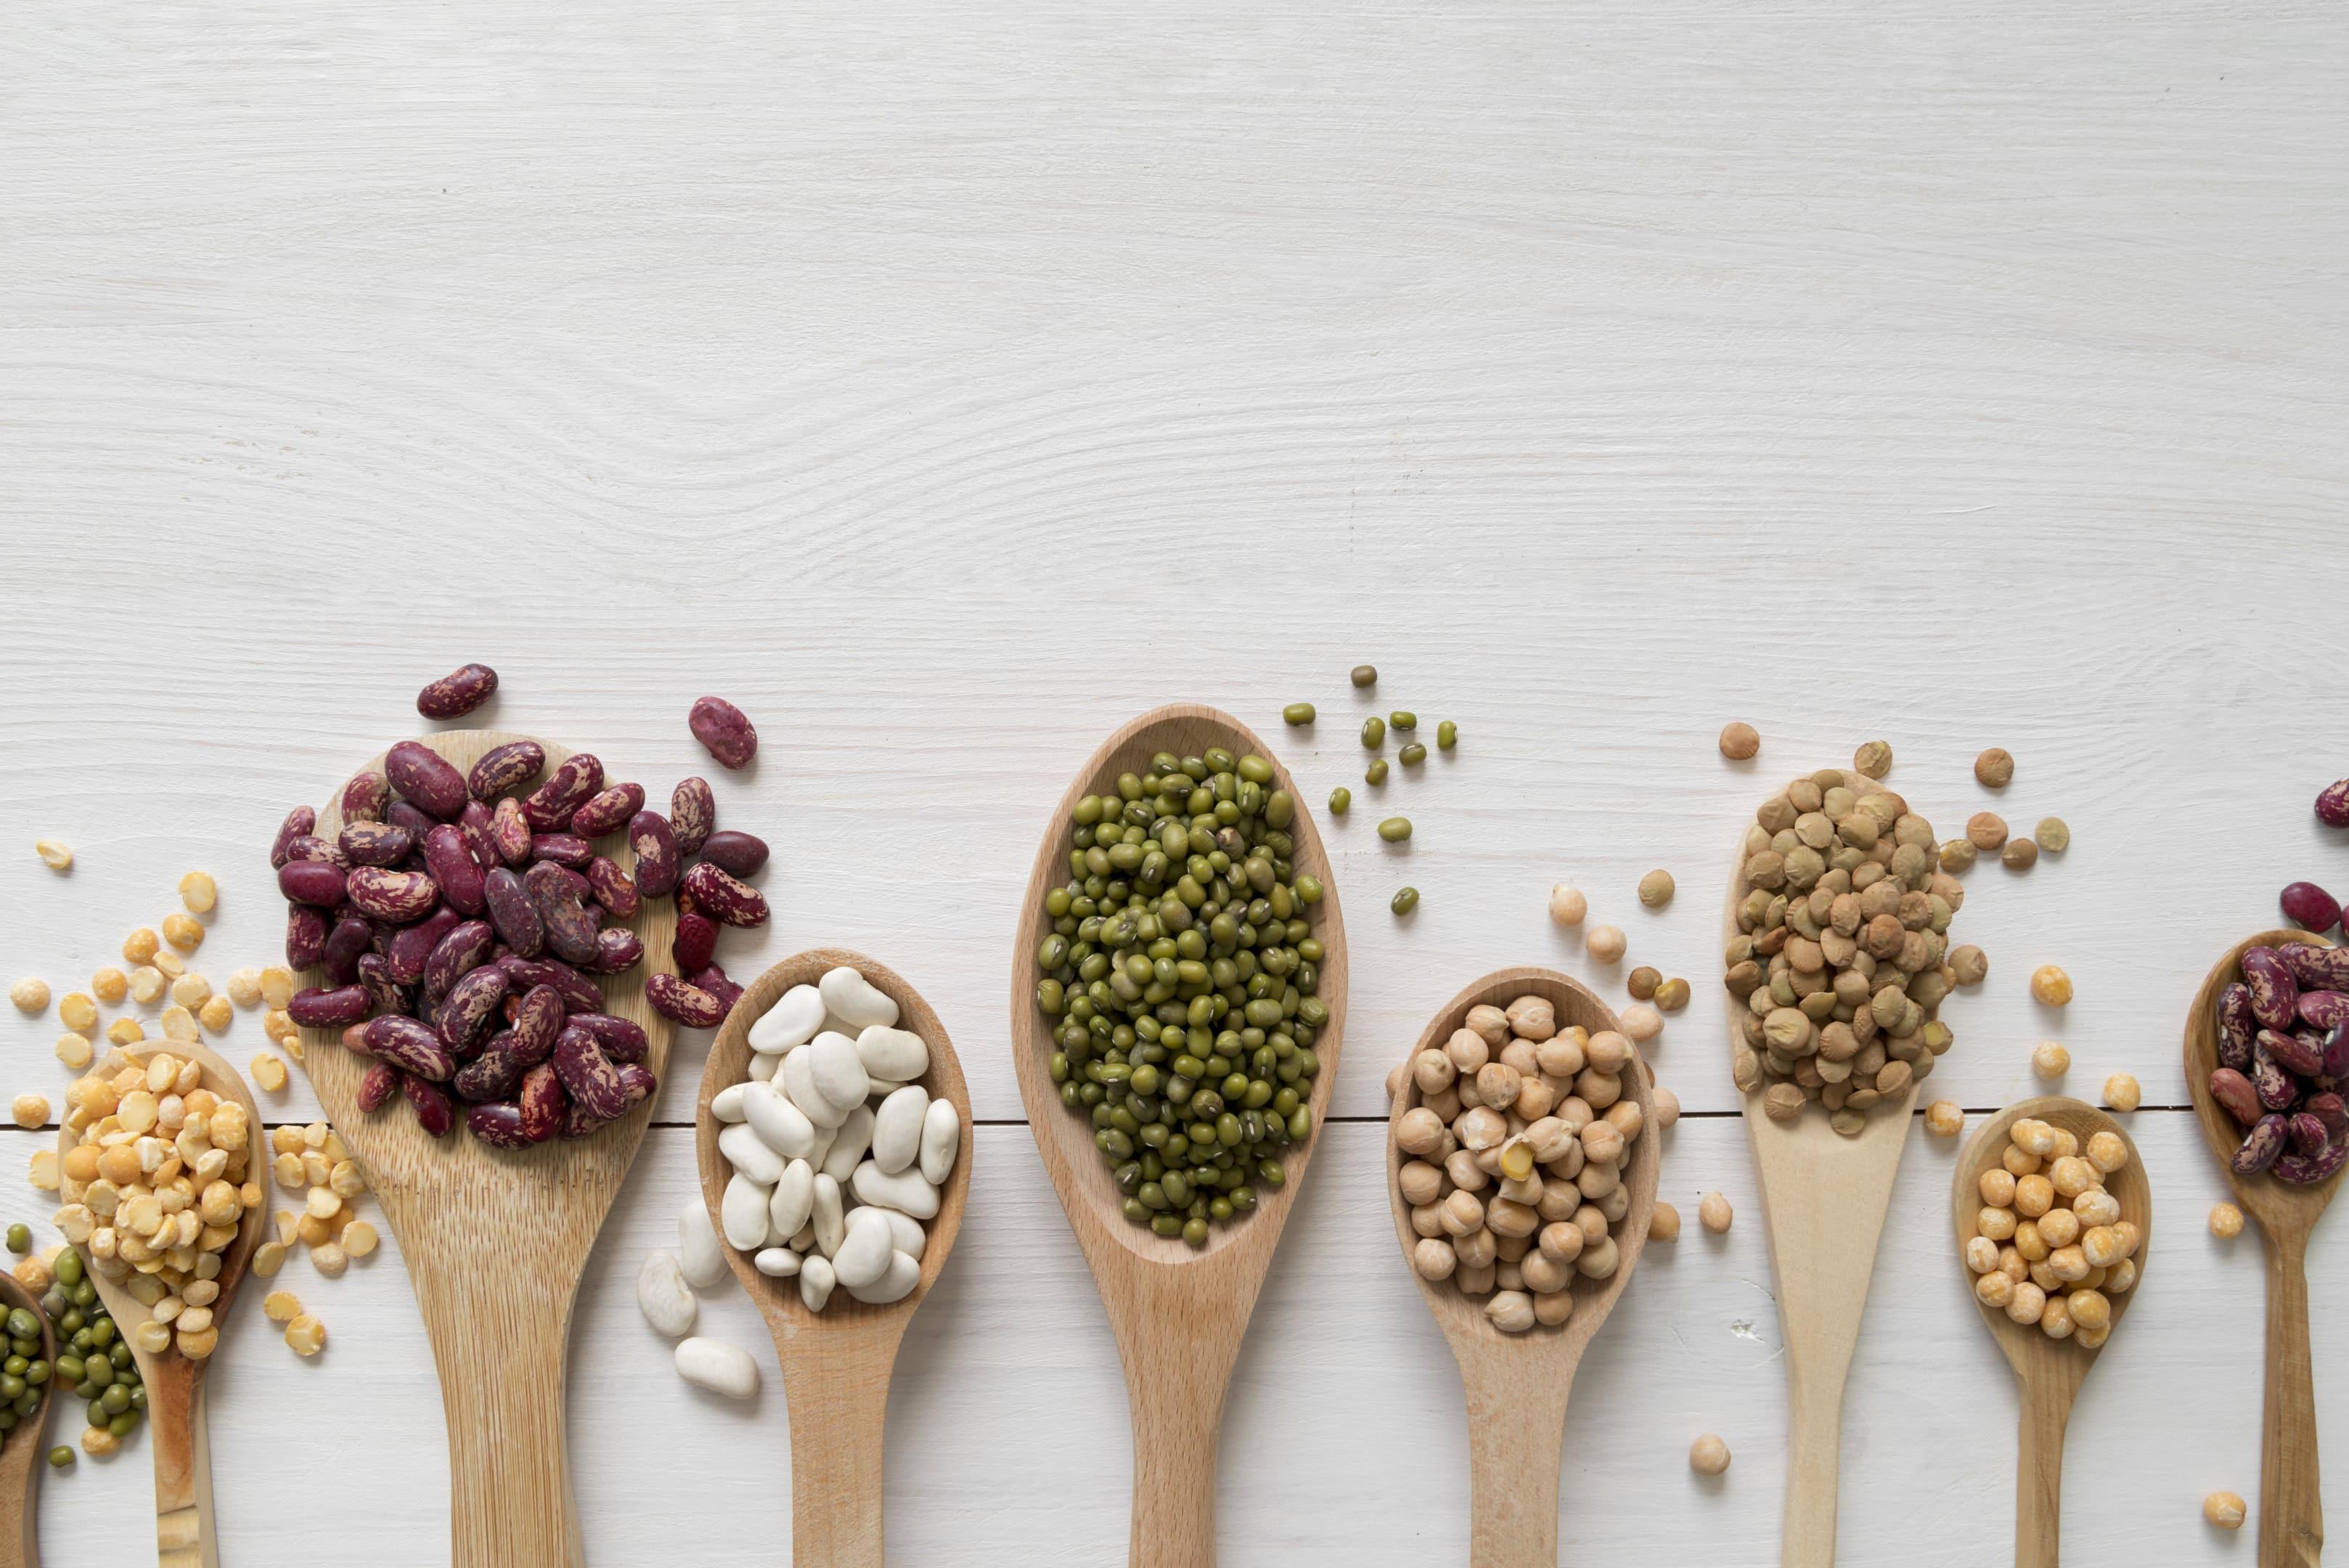 Beans arrangement on wooden table